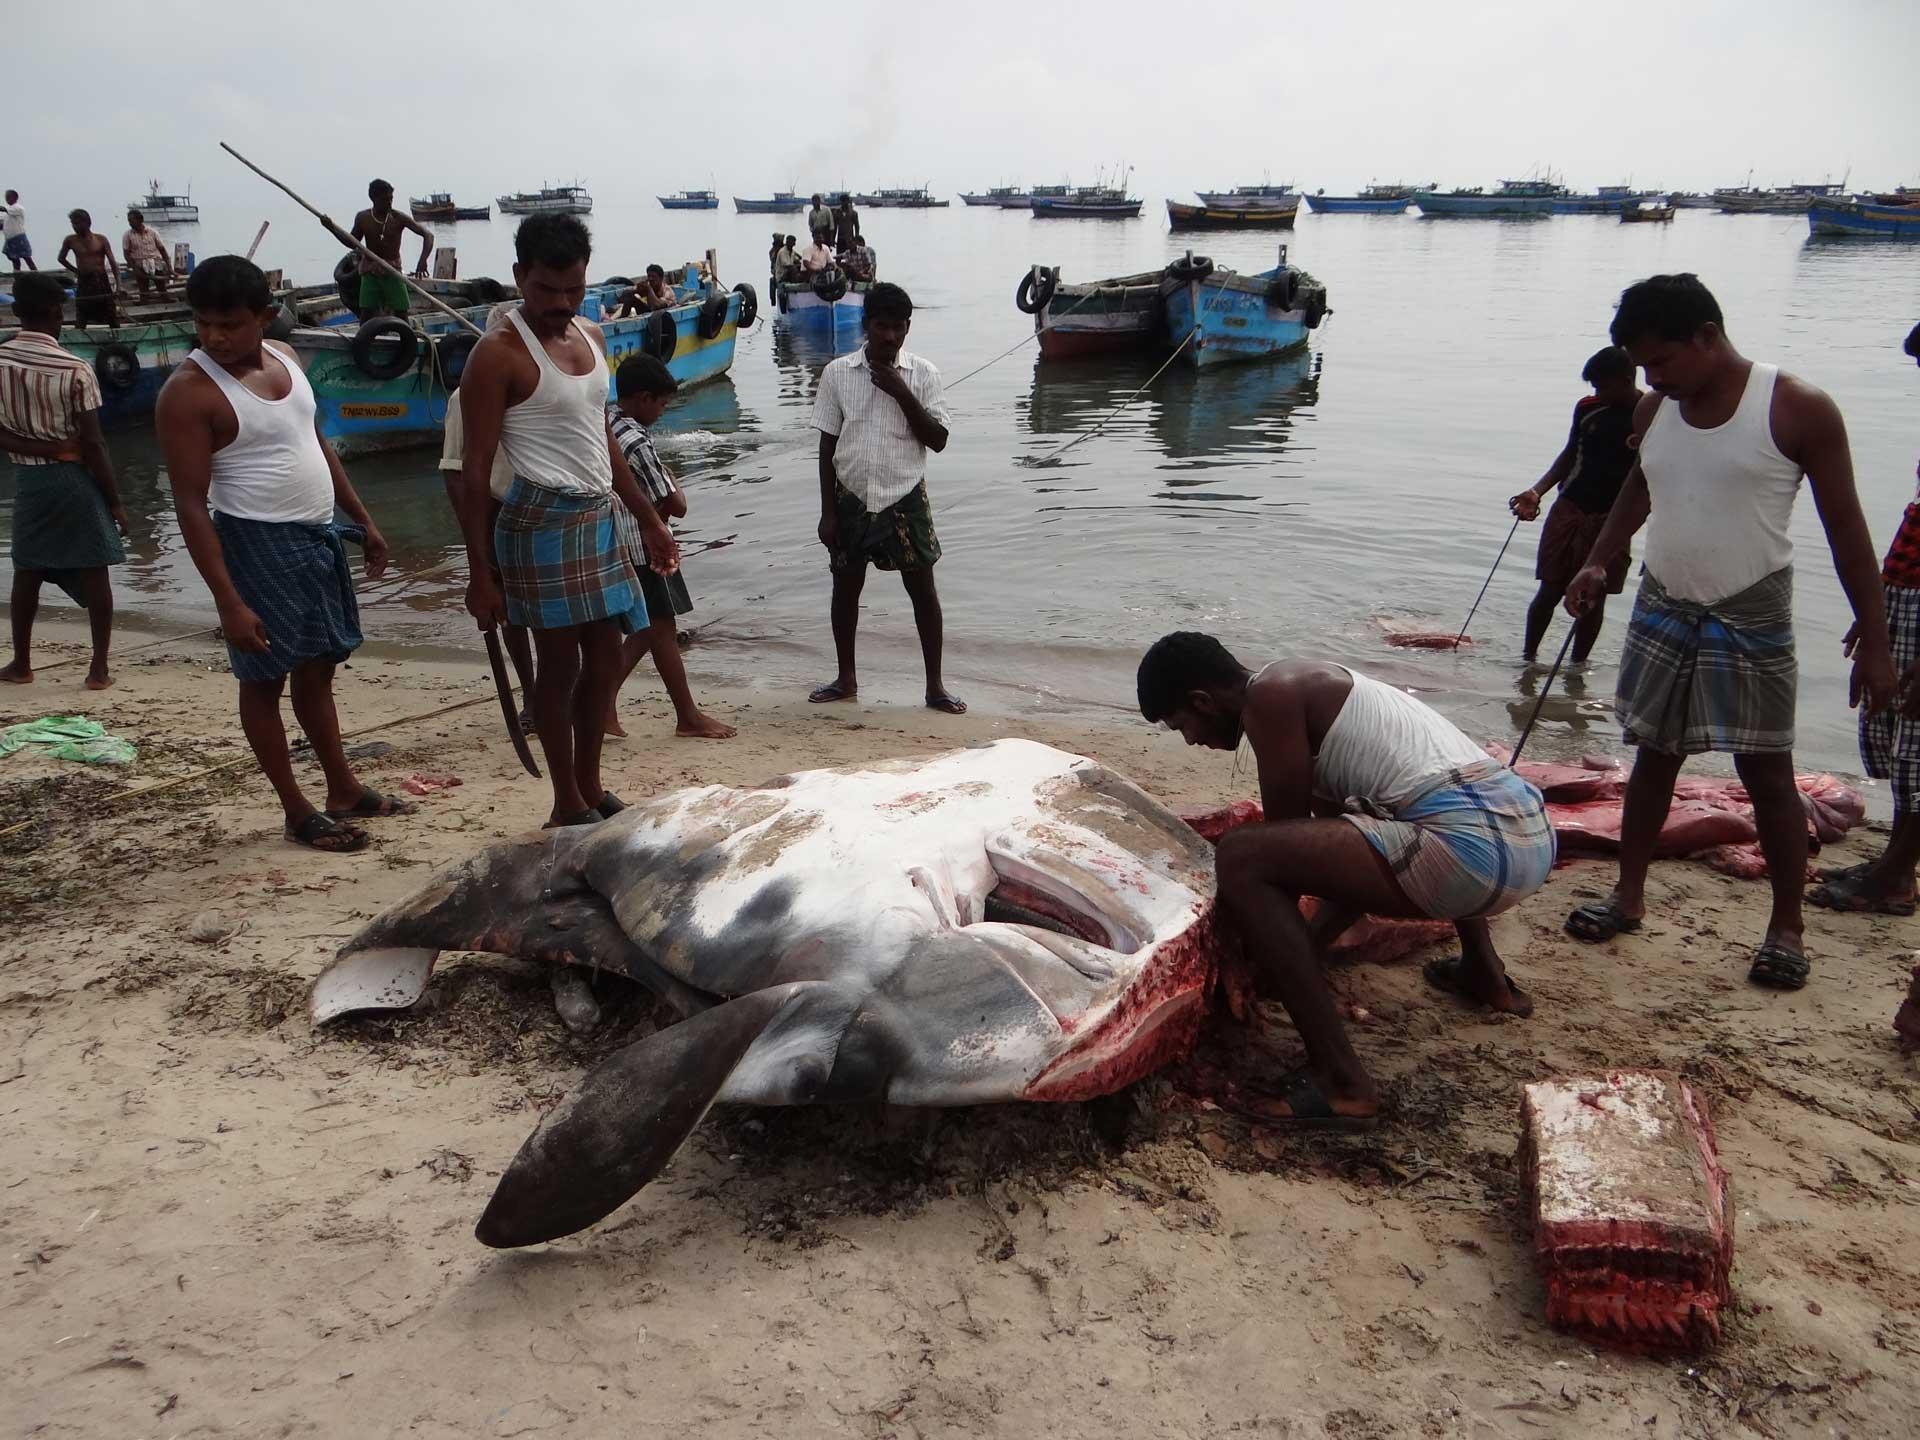 THEIVASINGAMANImohanraj - Mobulid fishery in India